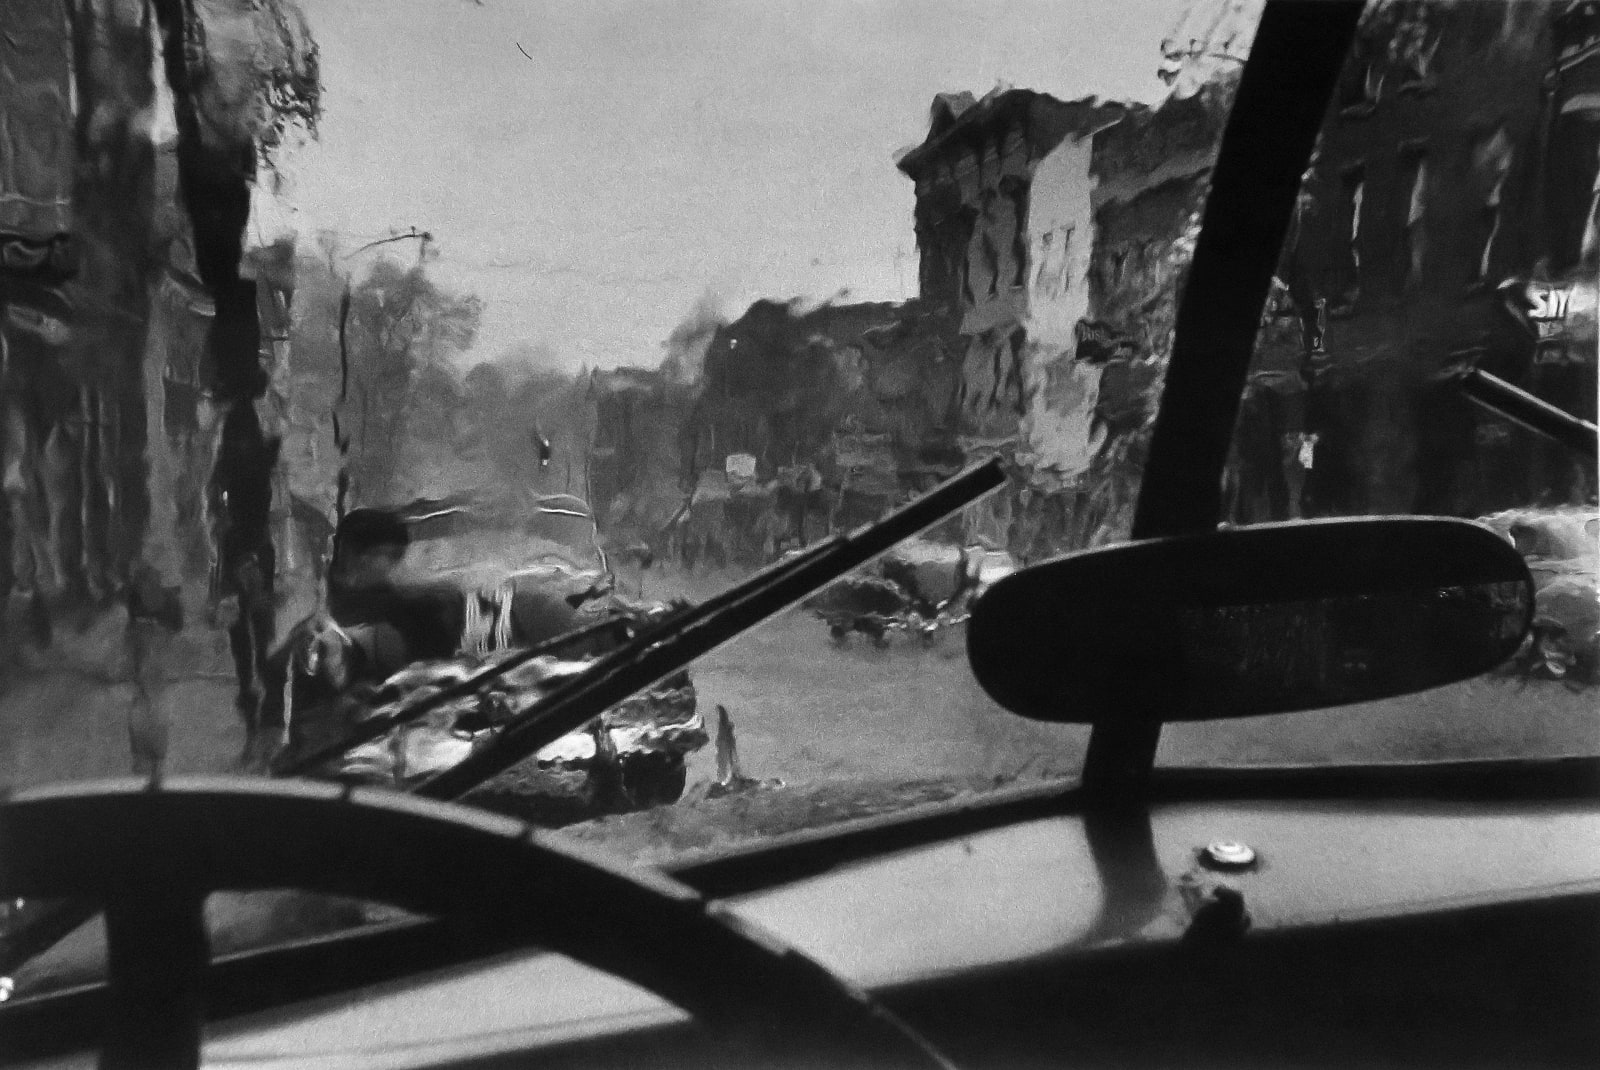 Louis Stettner - Saratoga Springs, 1951